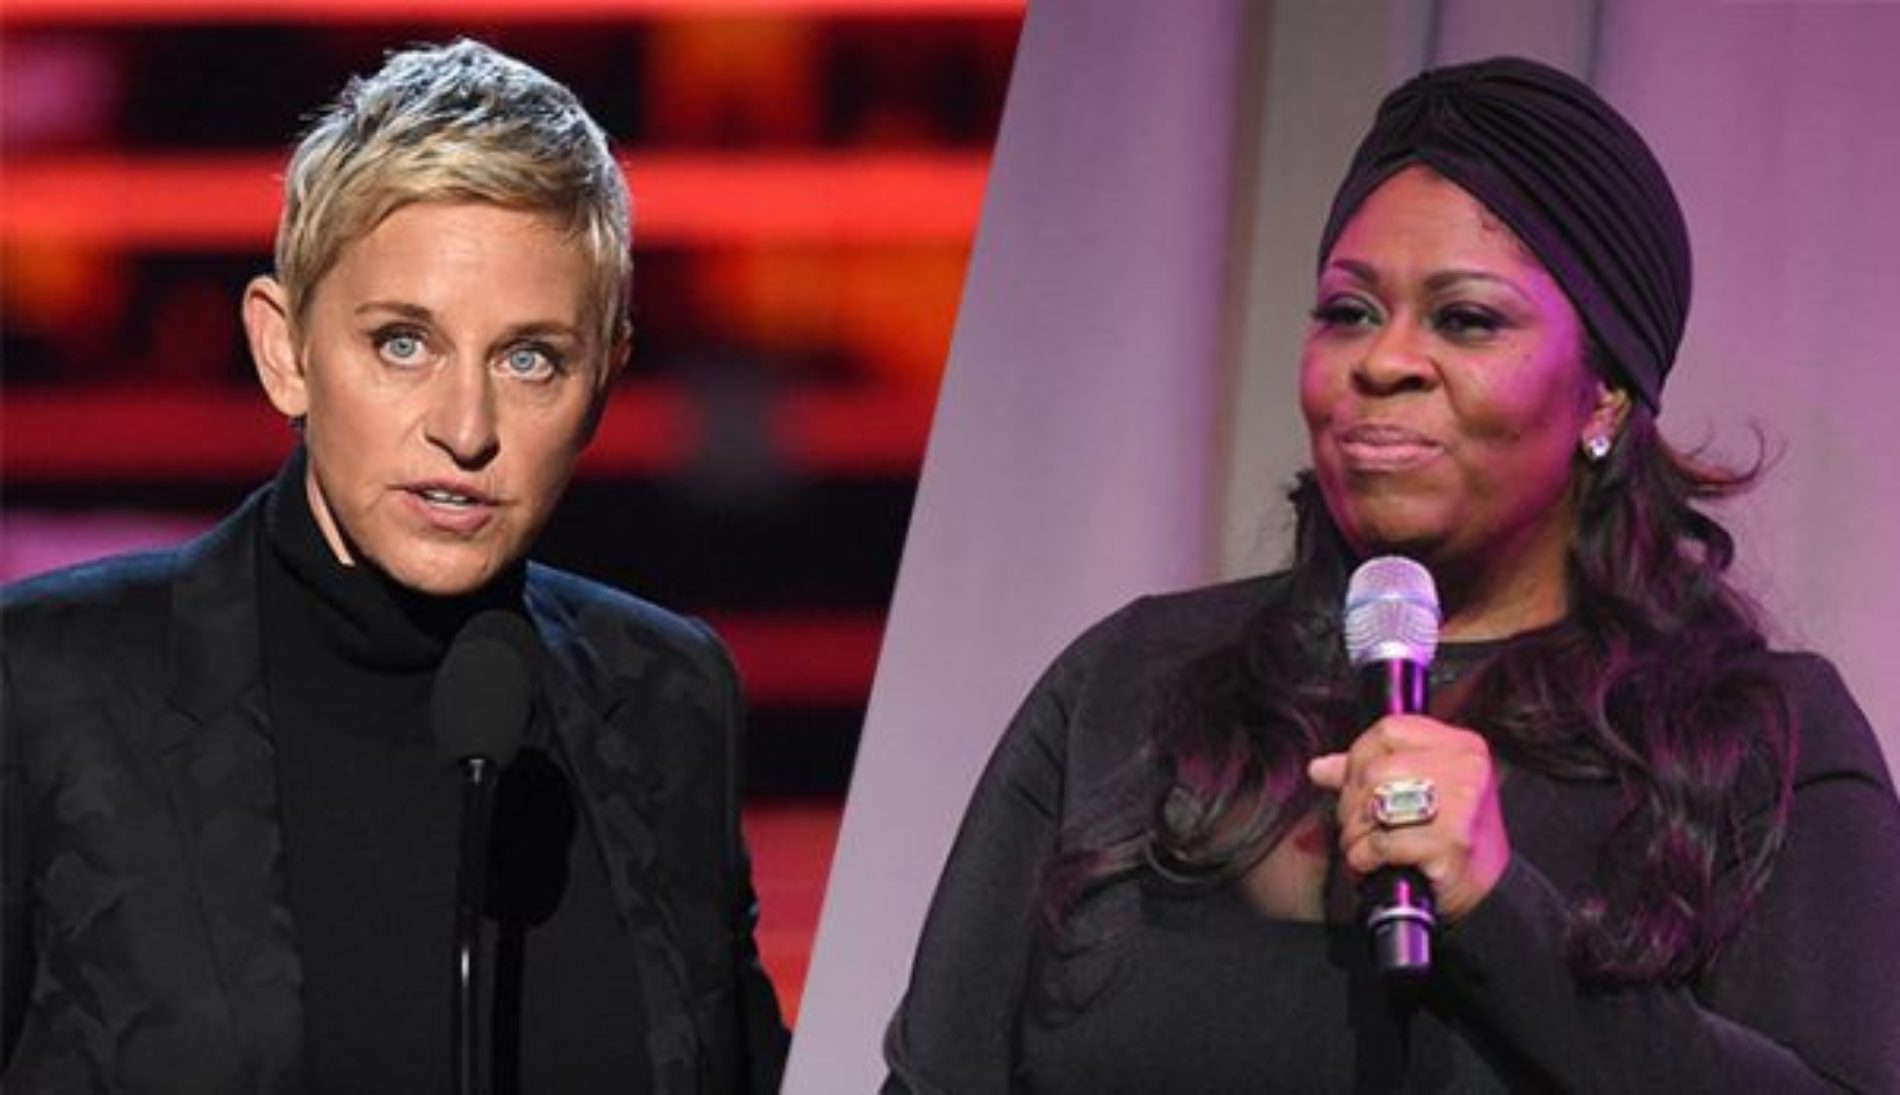 Ellen DeGeneres Confirms That Kim Burrell Will Not Appear On Her Show